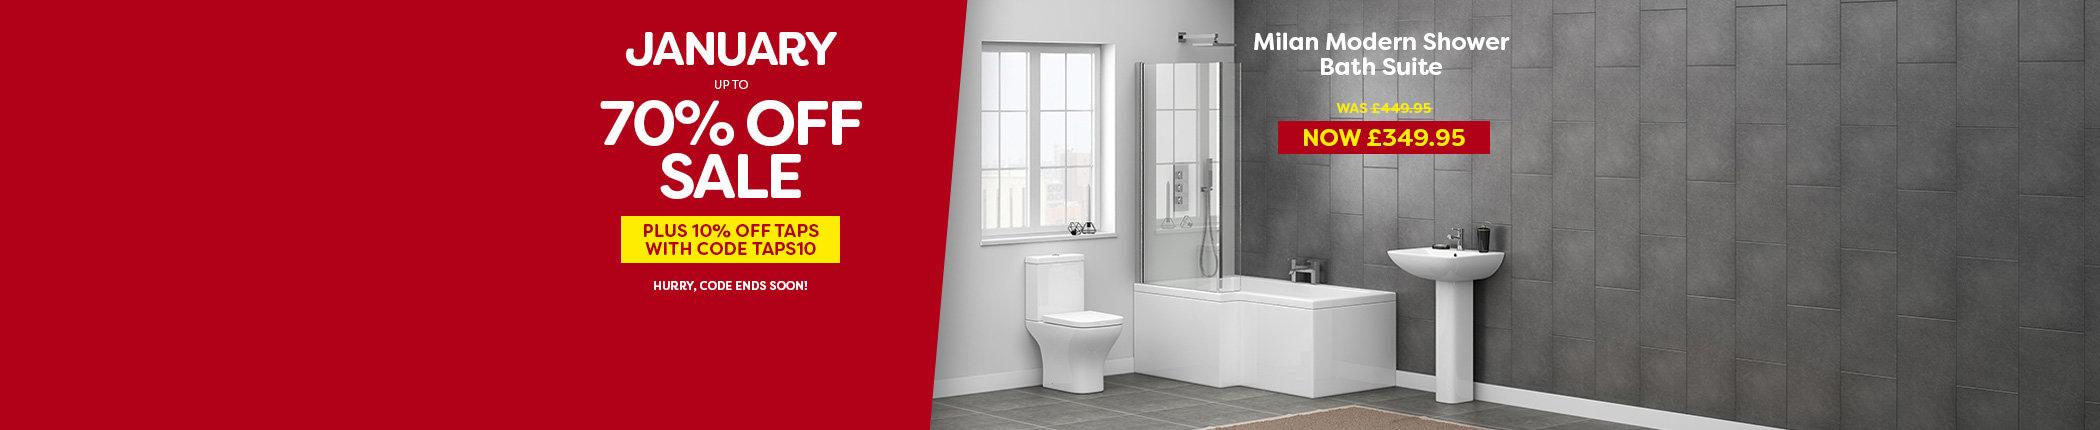 january-sale-10-off-taps-milan-modern-shower-bath-suite-countdown-jan18-hbnr